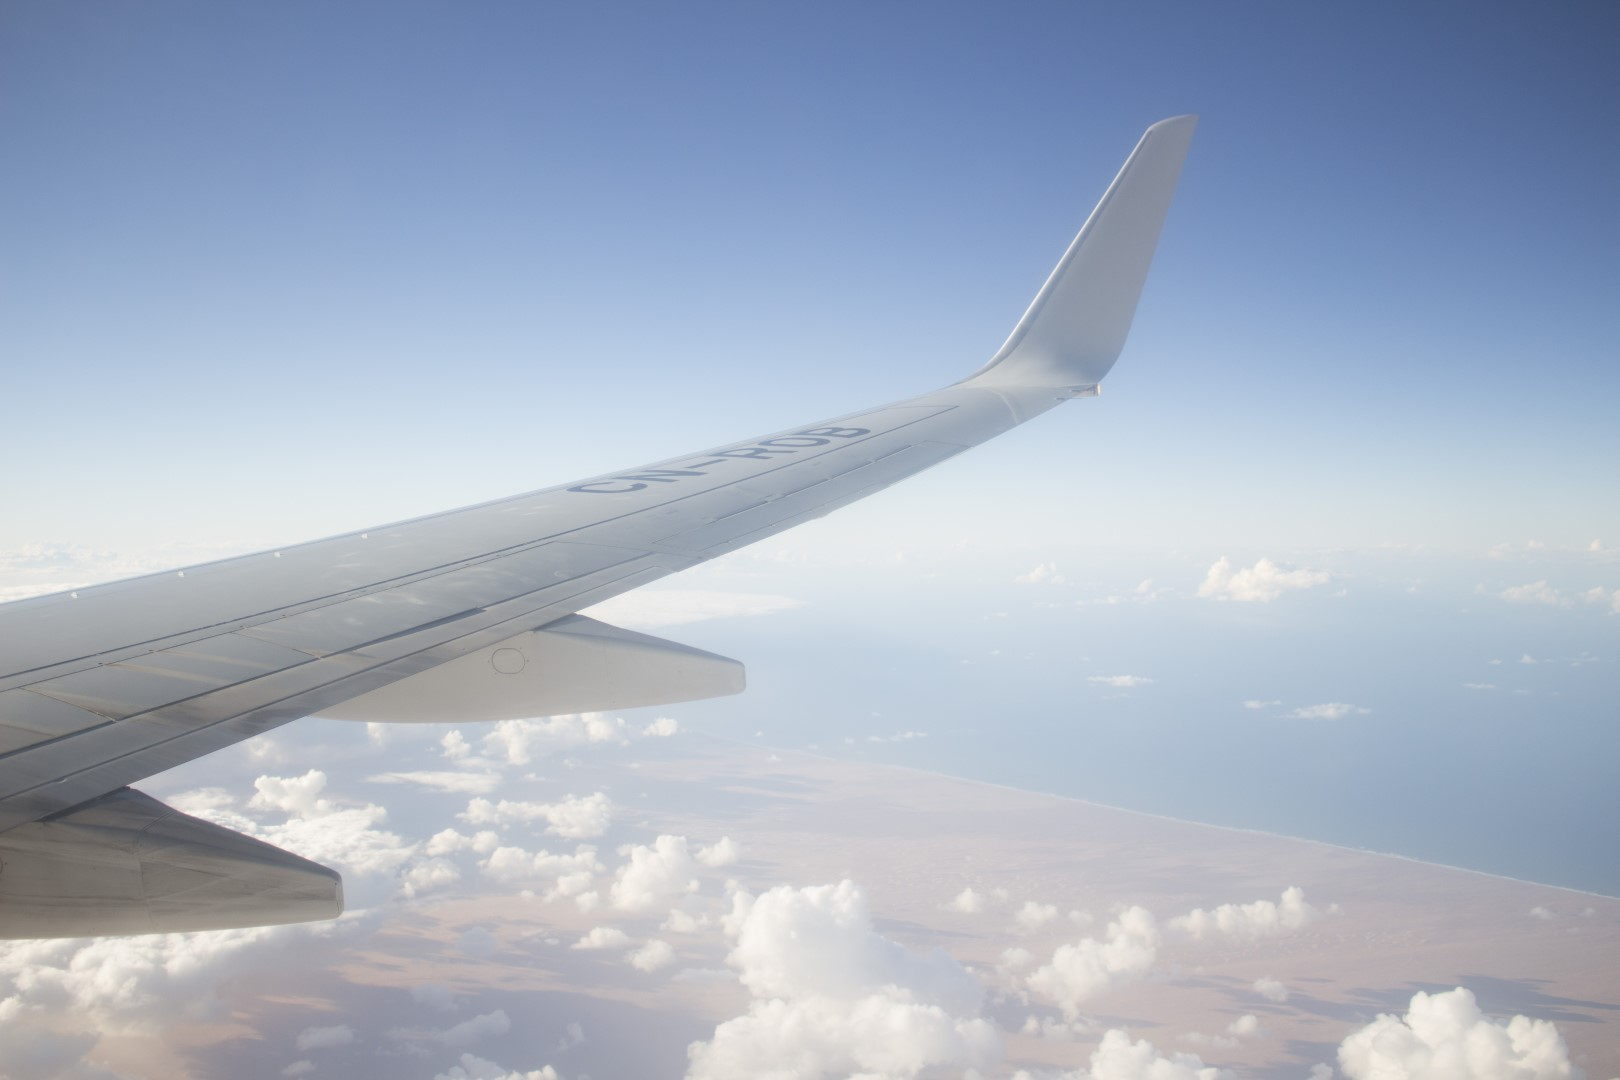 British Airways to end free food in coach on short flights